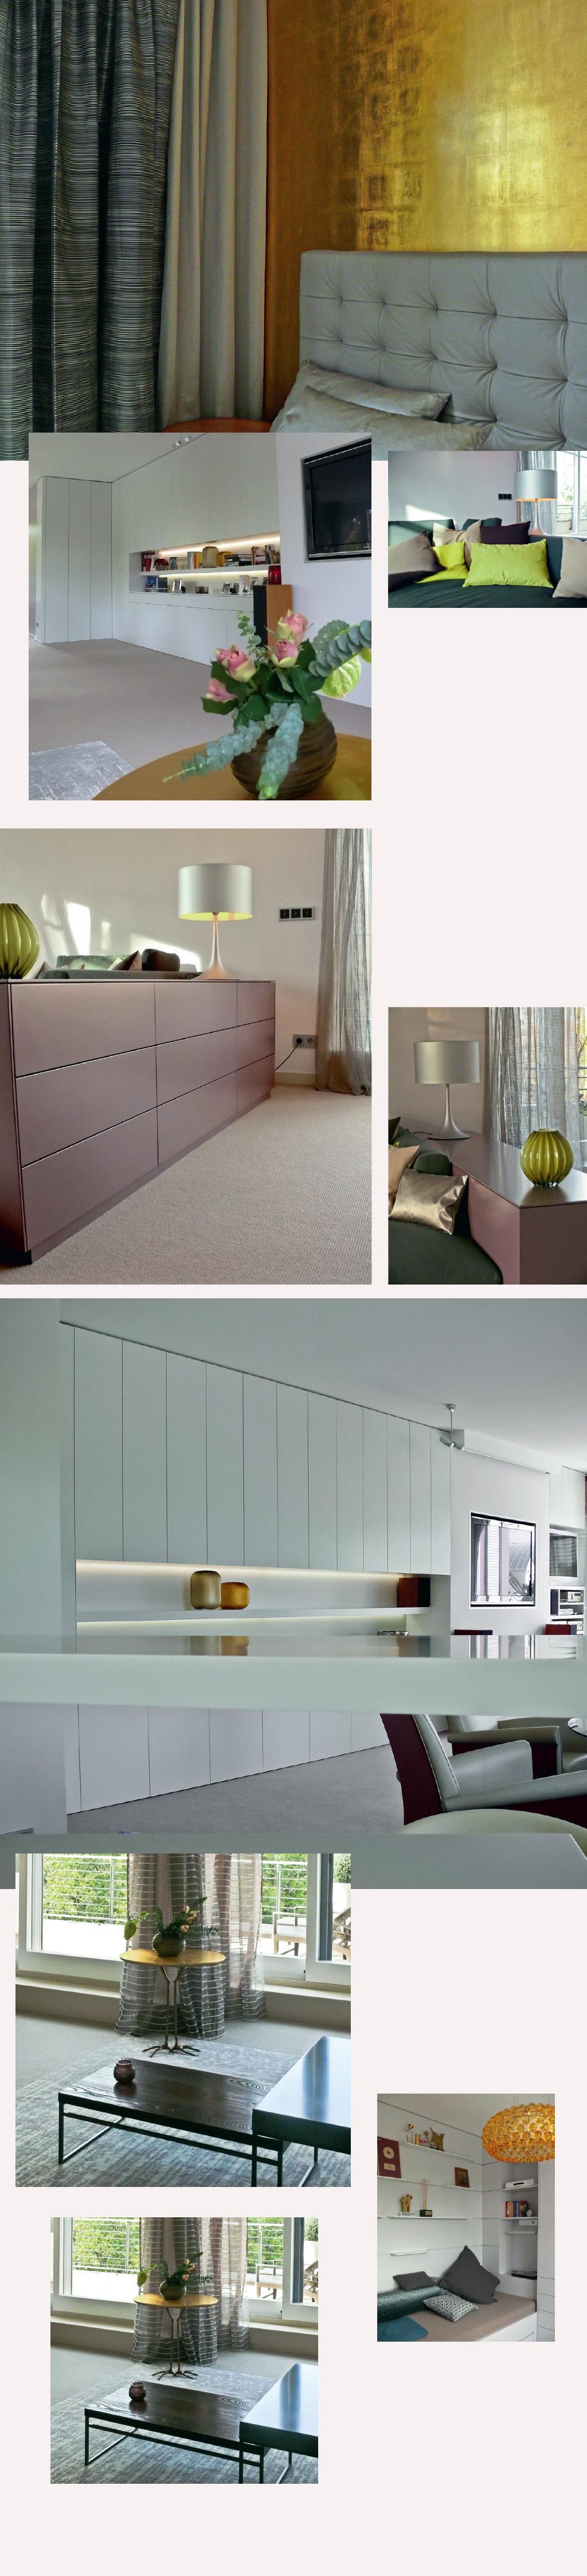 PenthouseBerlin – Harry Clark Interior Design / Innenarchitektur